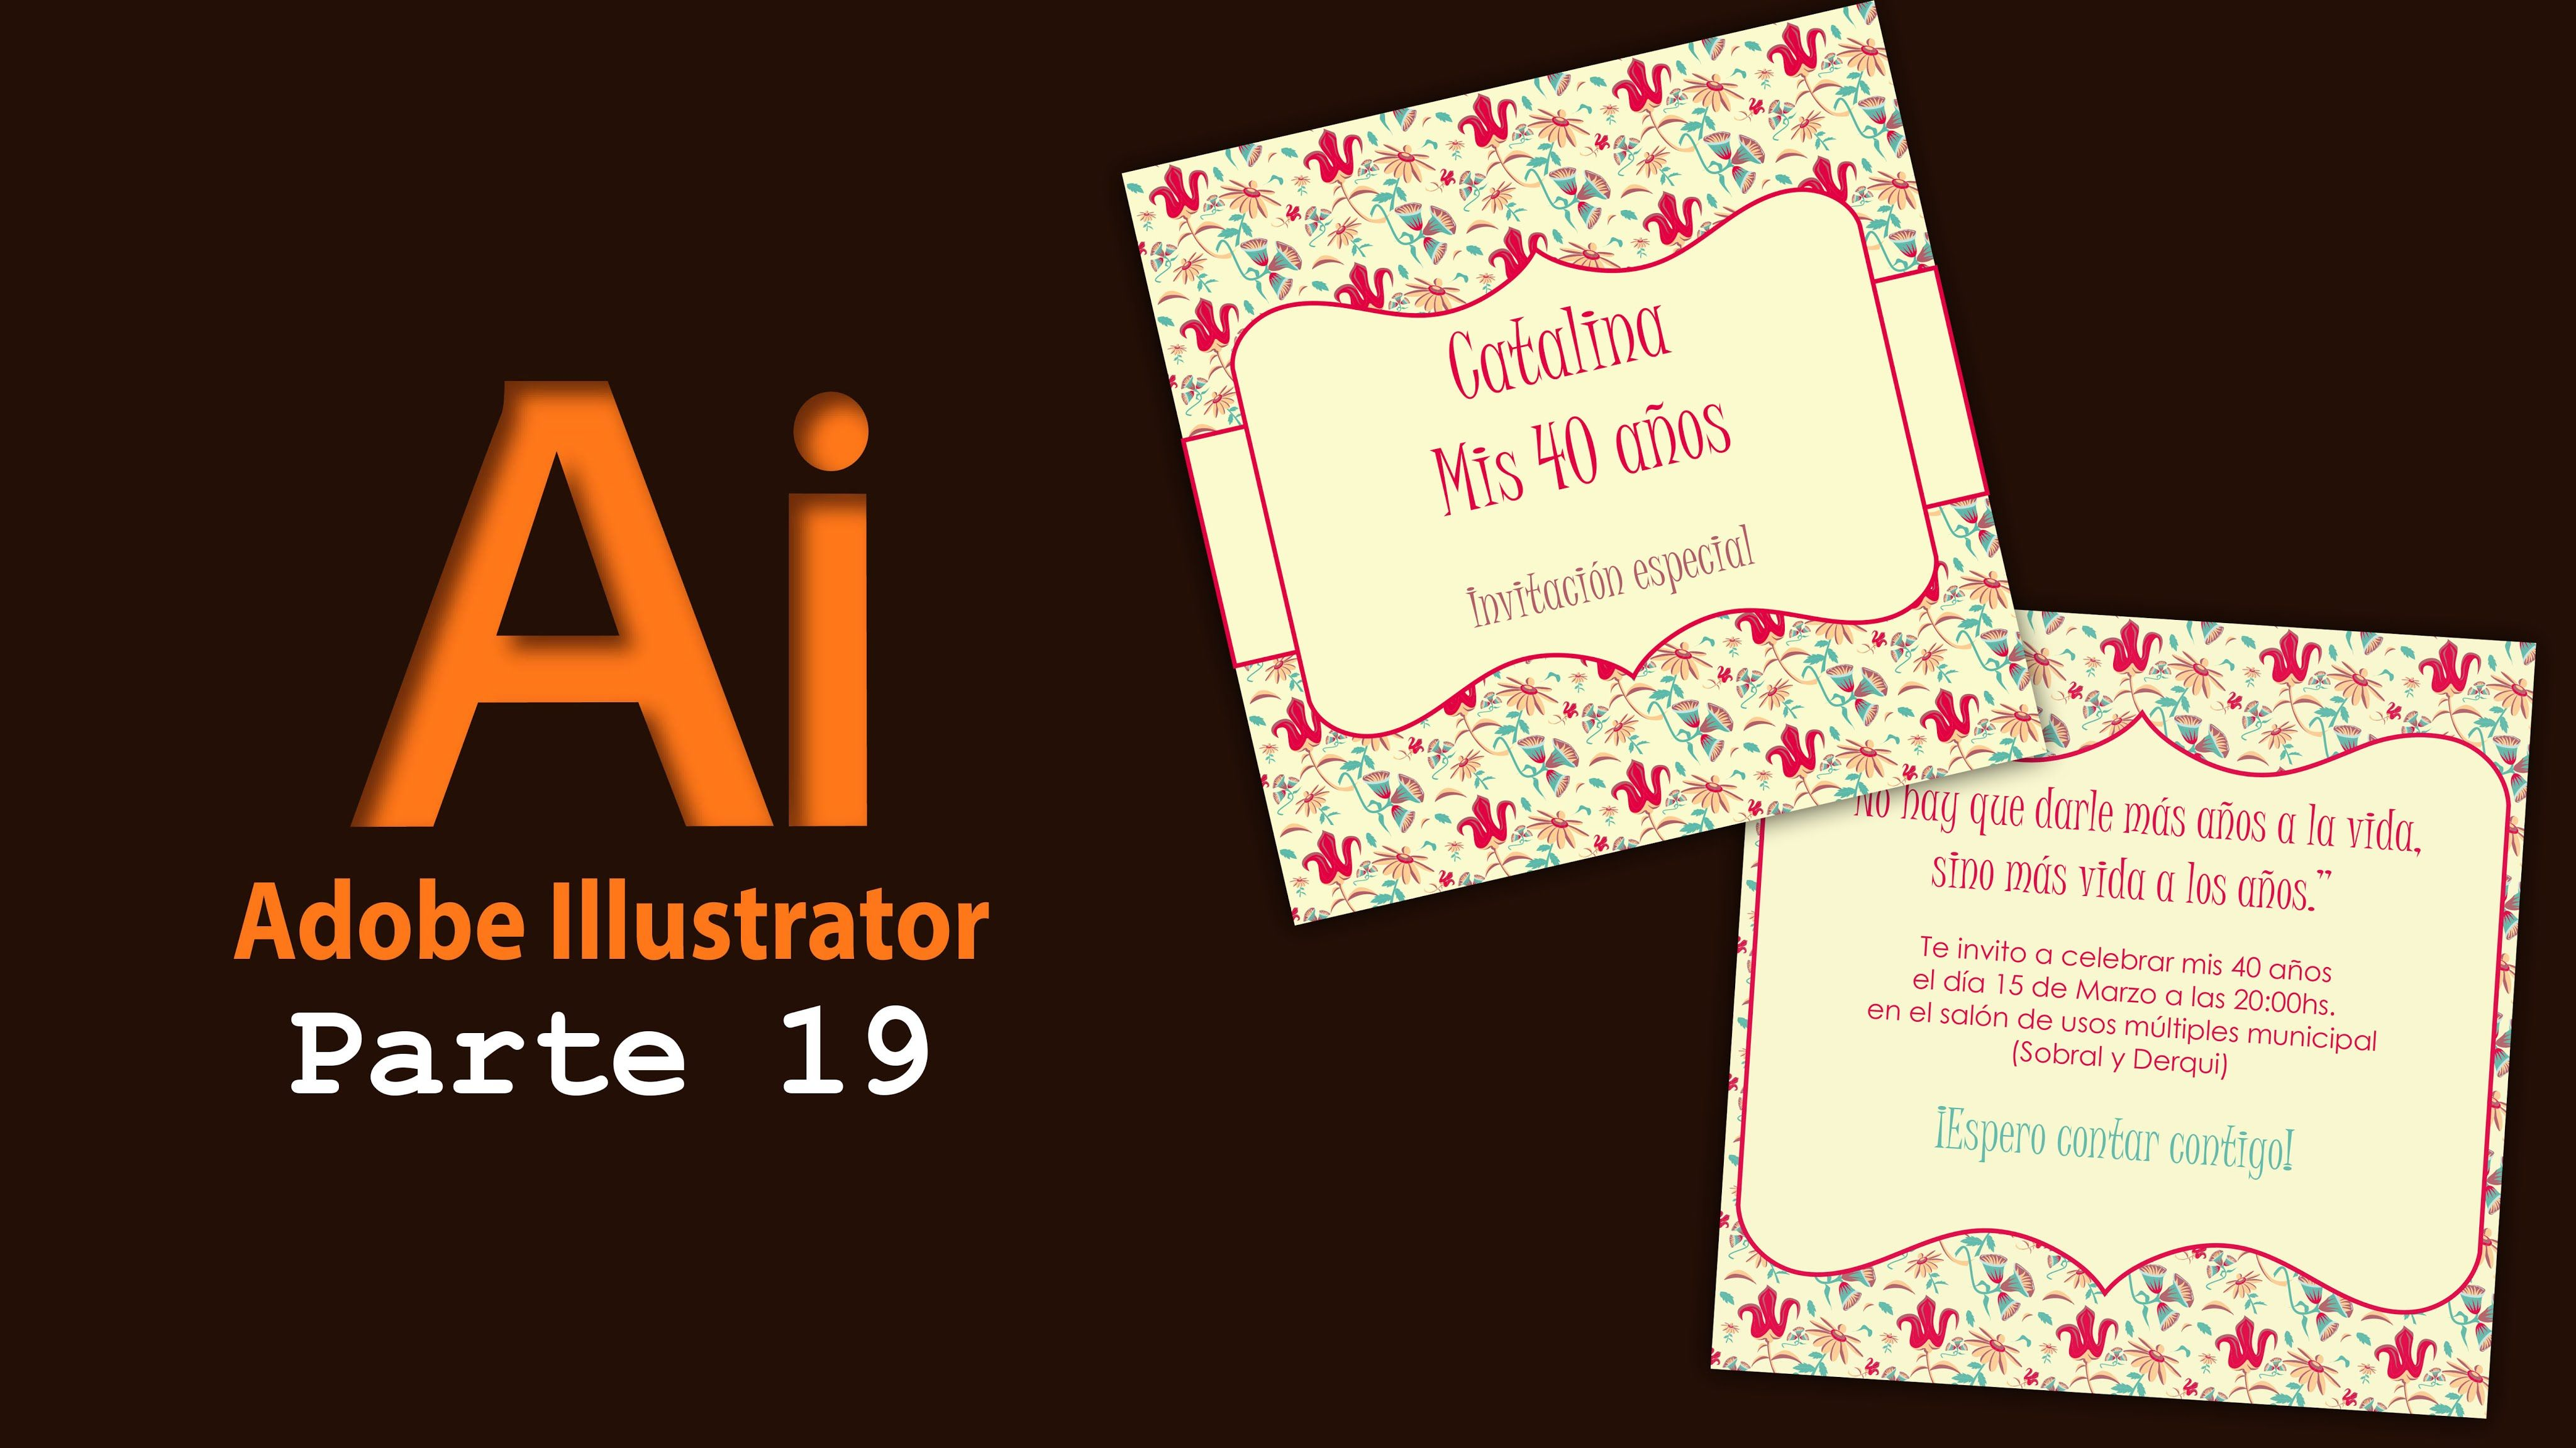 Adobe Illustrator 19 Crear Tarjeta De Invitación Tarjetas